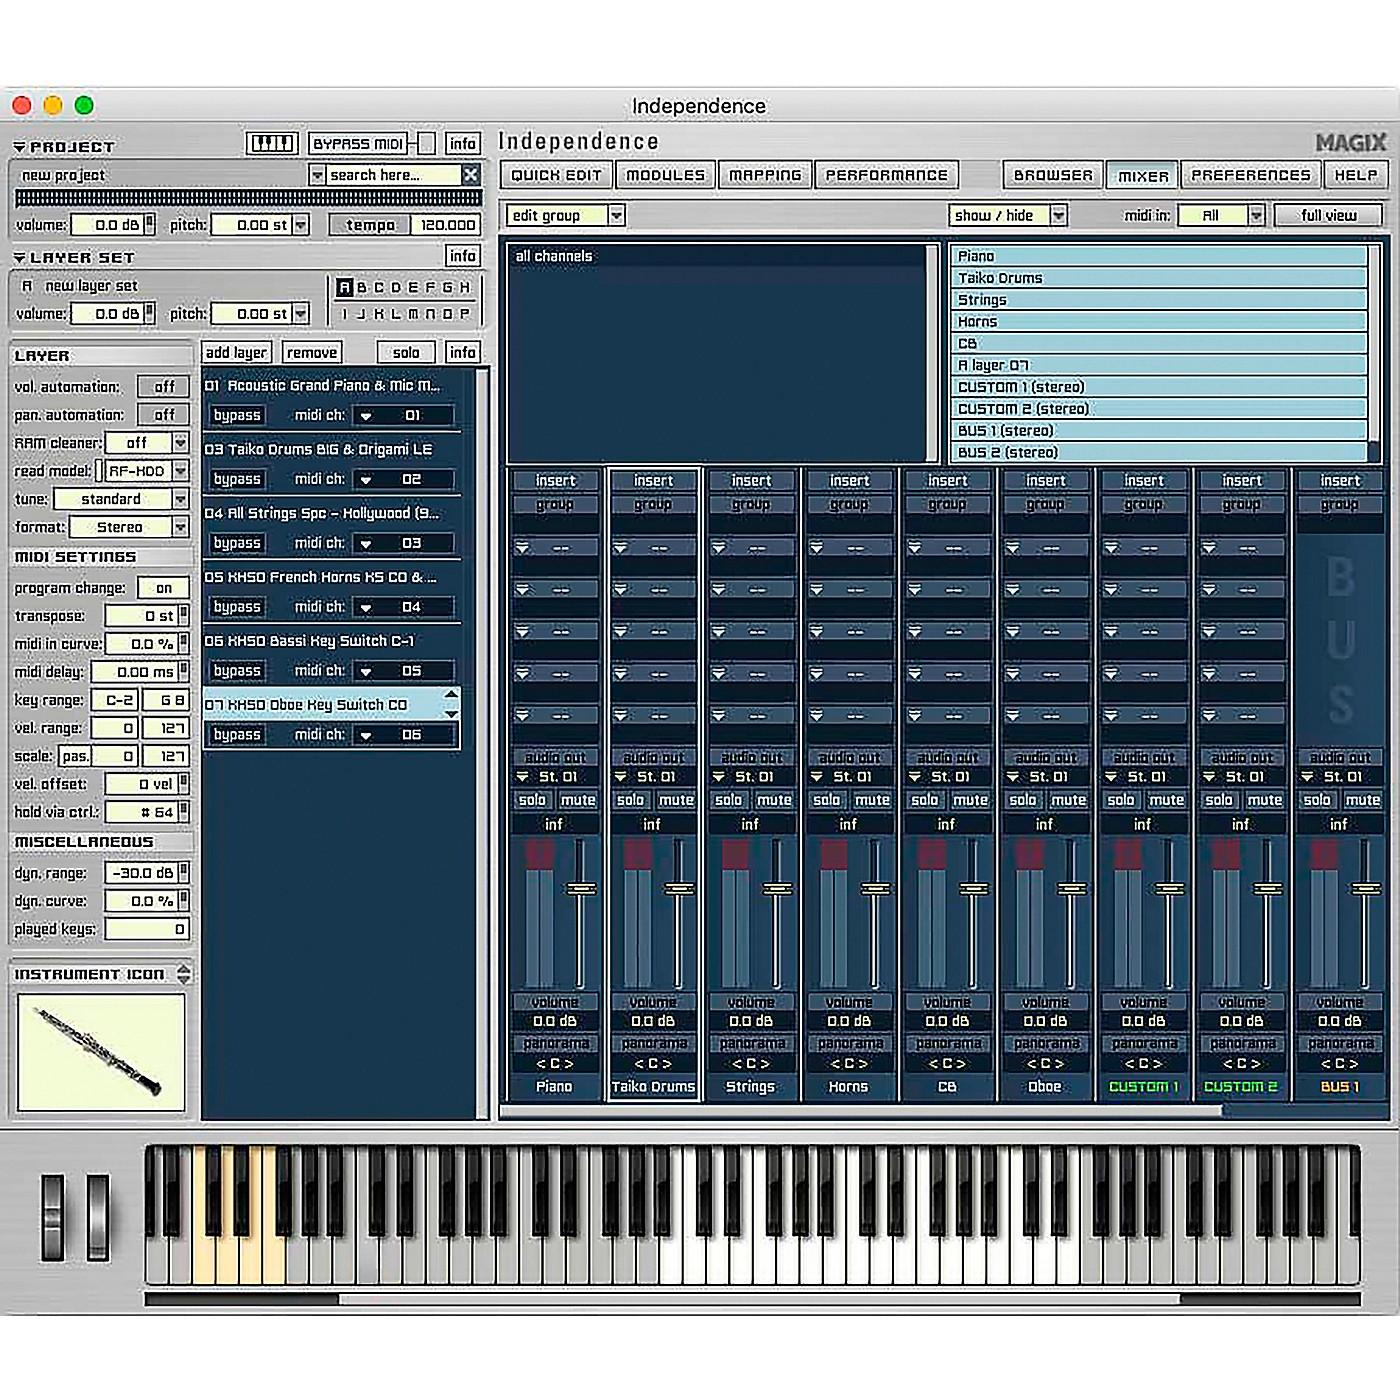 Magix Independence Pro Suite PC/MAC thumbnail